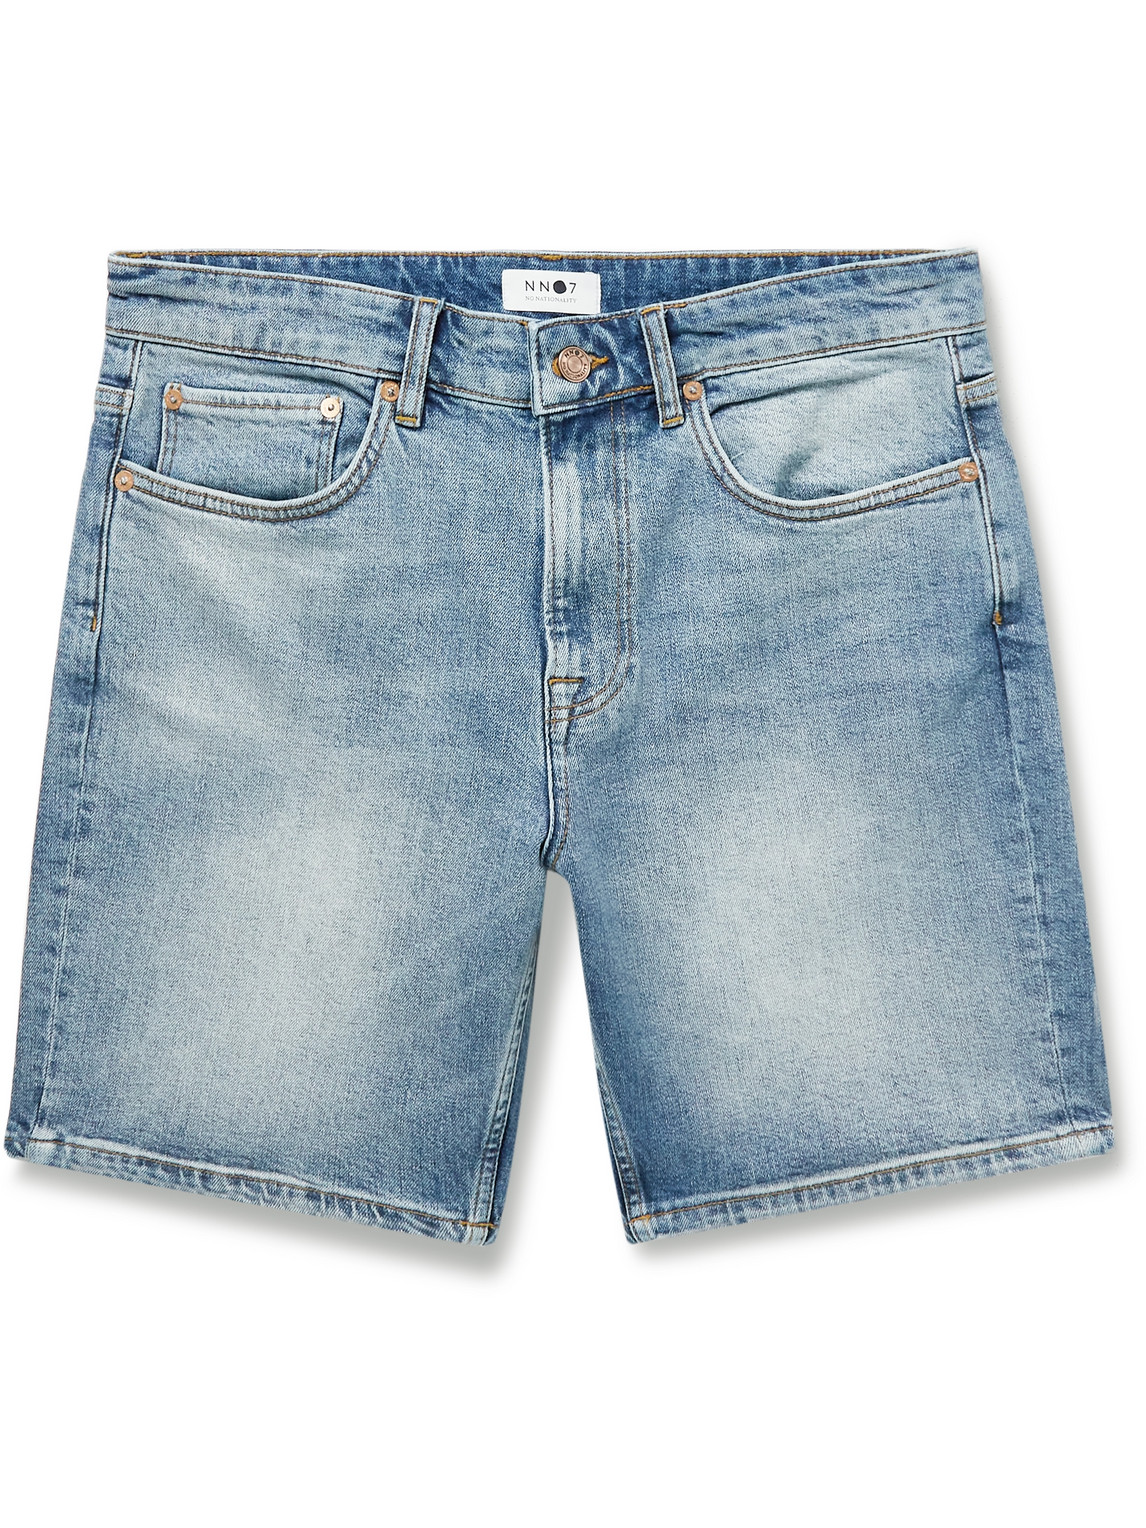 Nn07 - Johnny Slim-Fit Denim Shorts - Men - Blue - Uk/Us 30